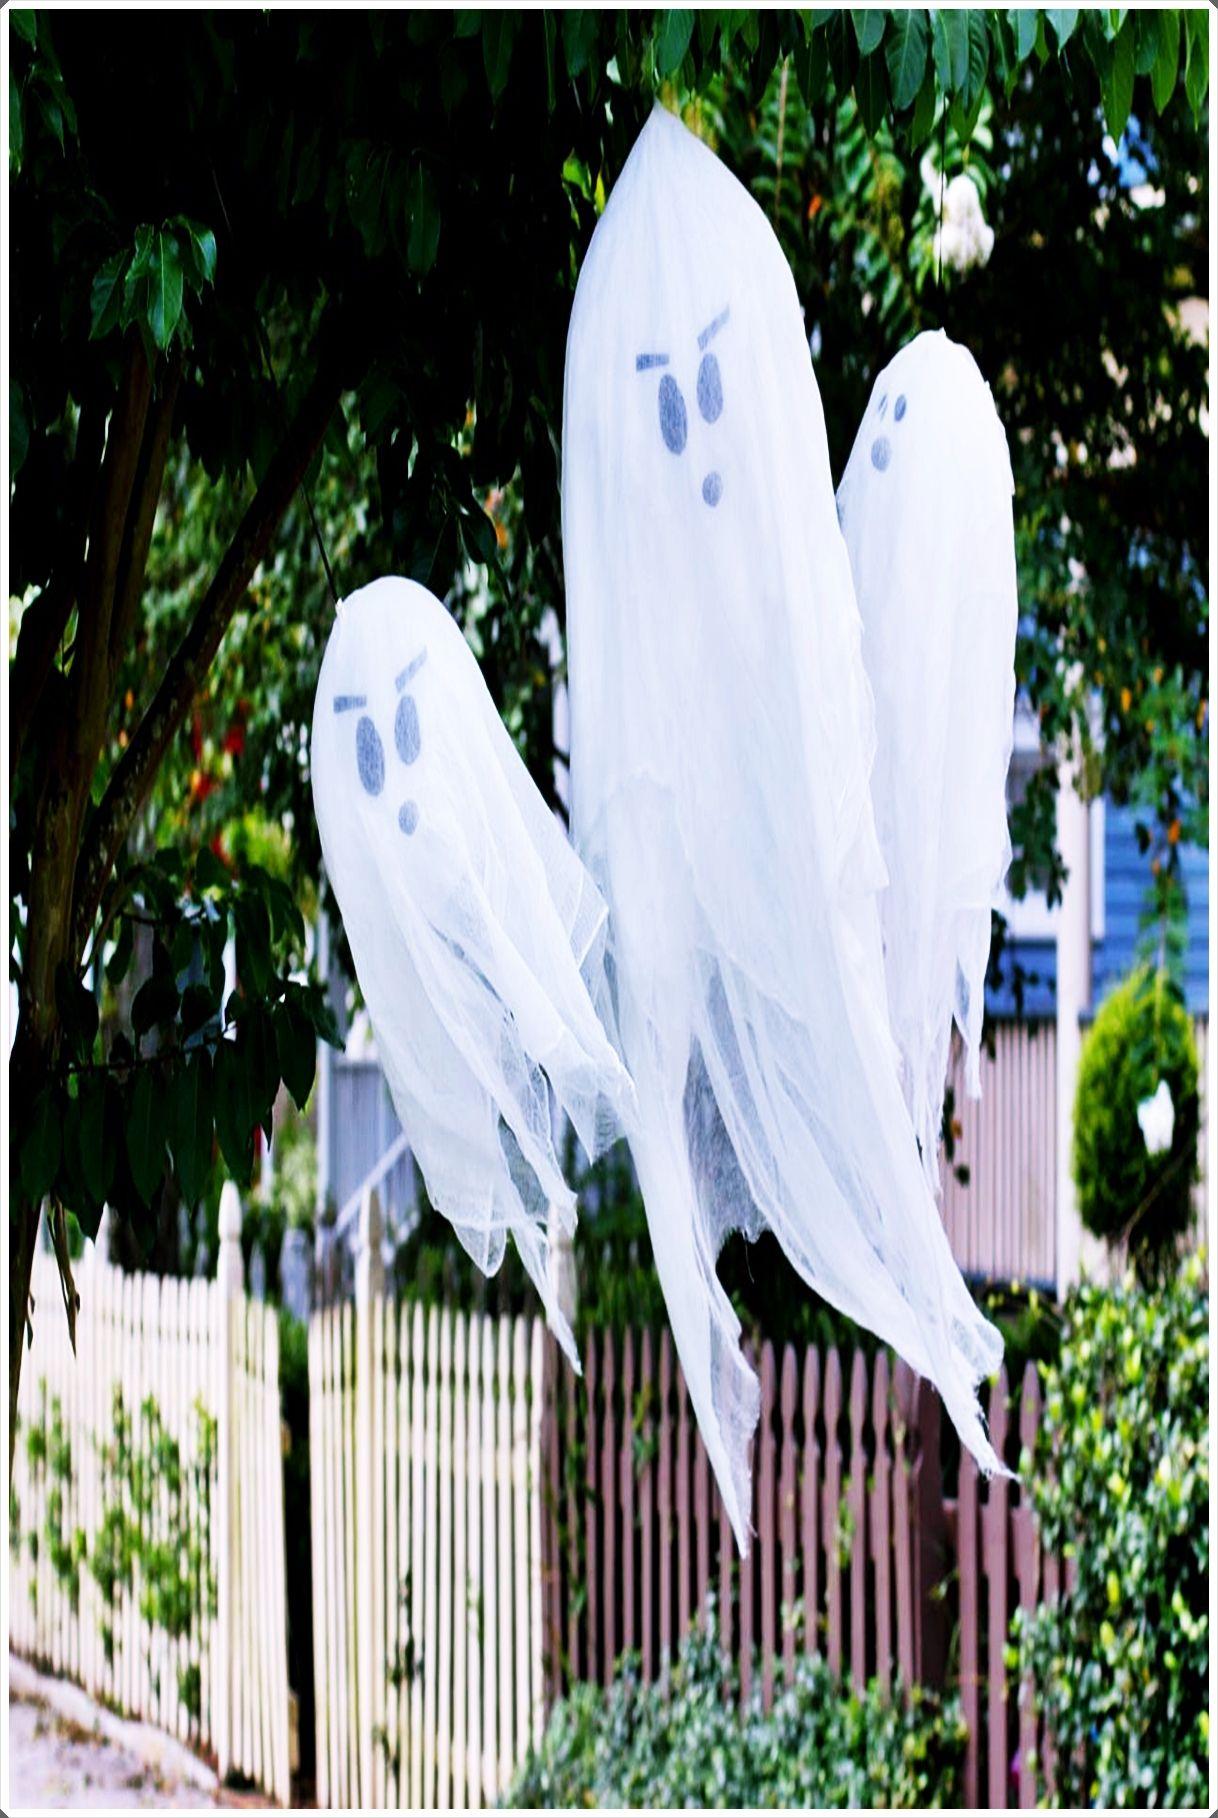 Easy Homemade Outdoor Halloween Decorations Trends 2020 When